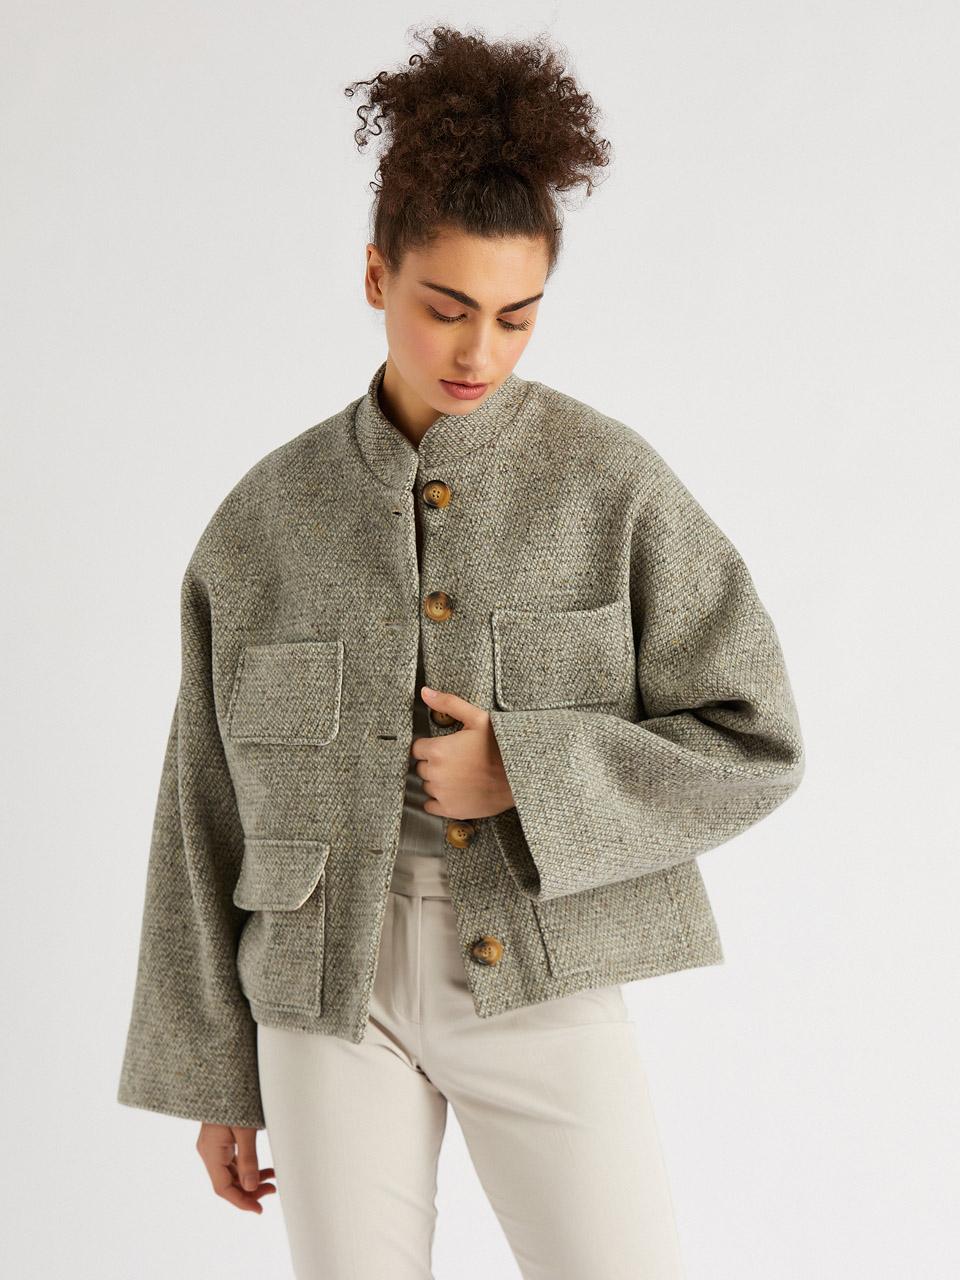 Wide Cut Judge Collar Wool Jacket